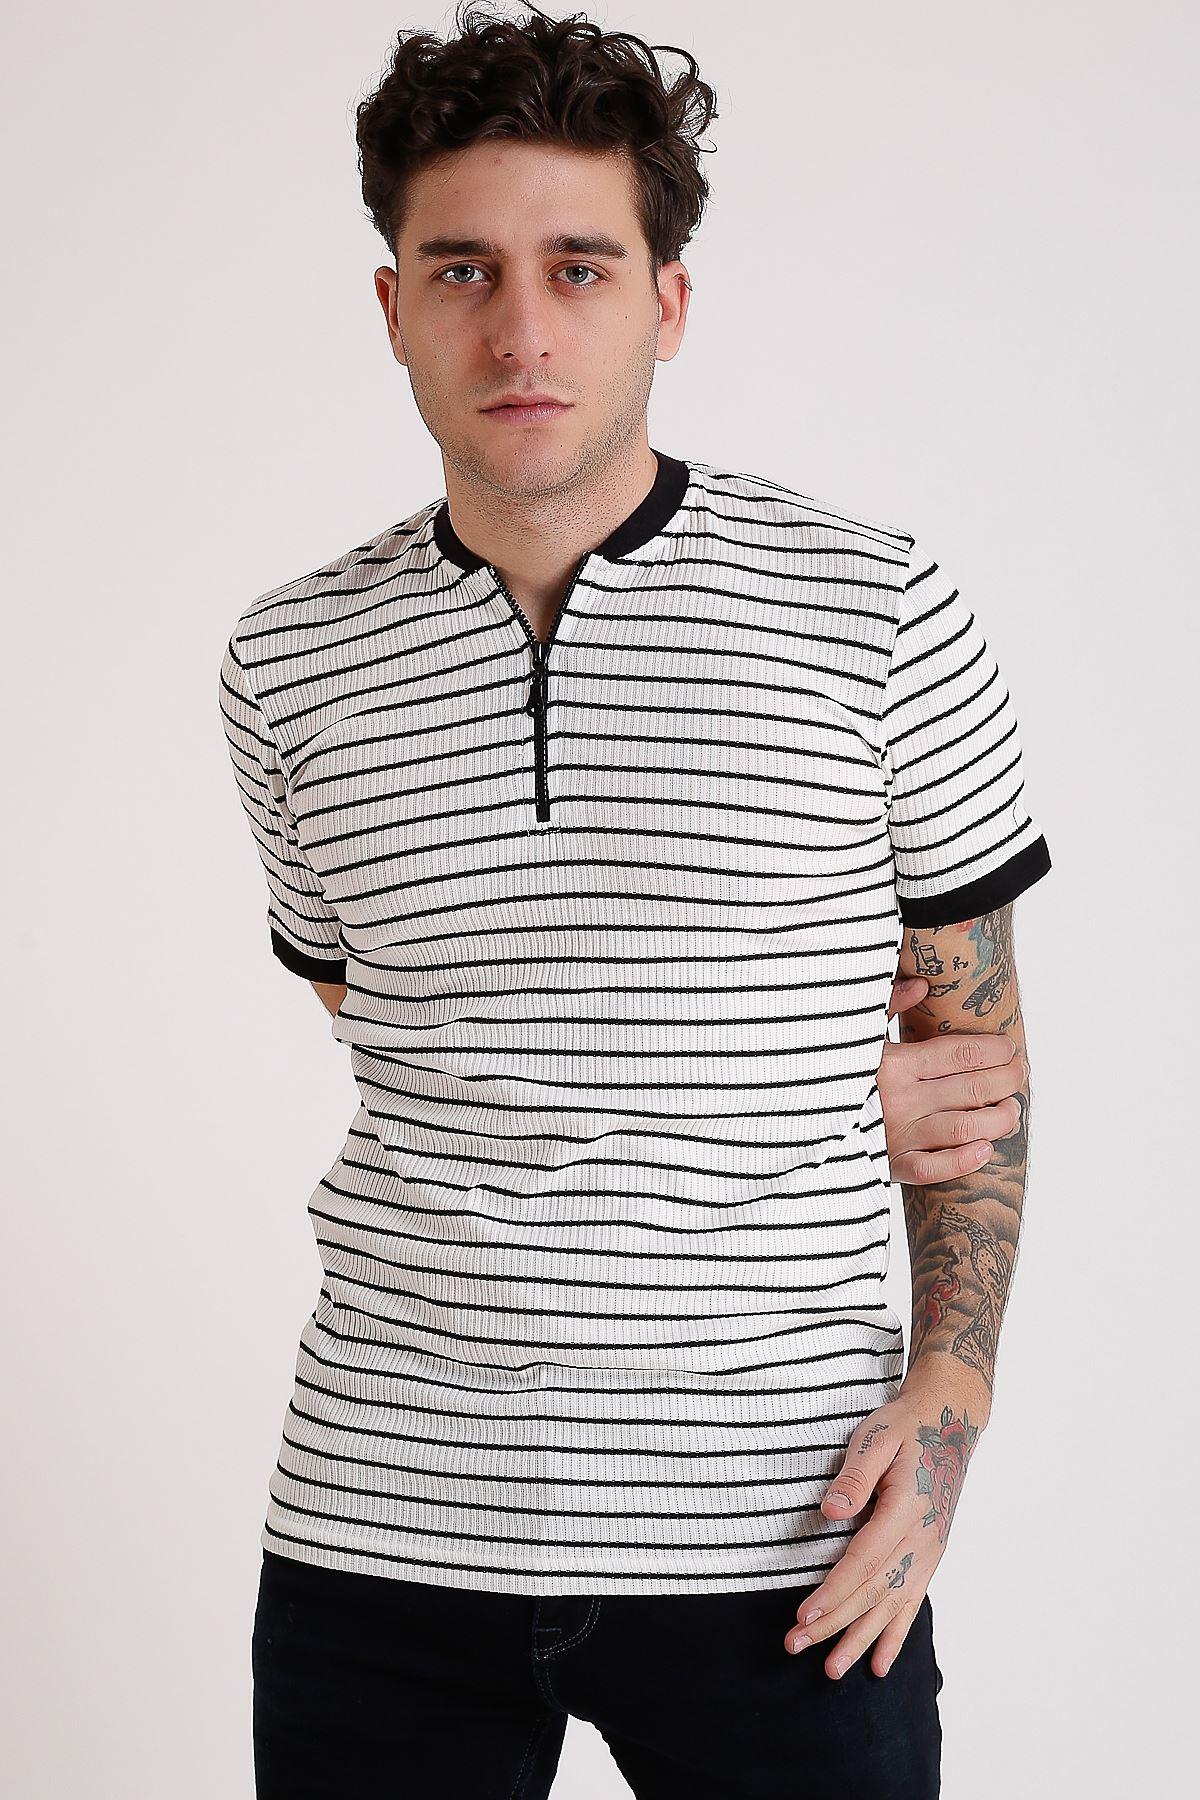 Erkek Hakim yaka Beyaz Çizgili Fermuarlı T-Shirt